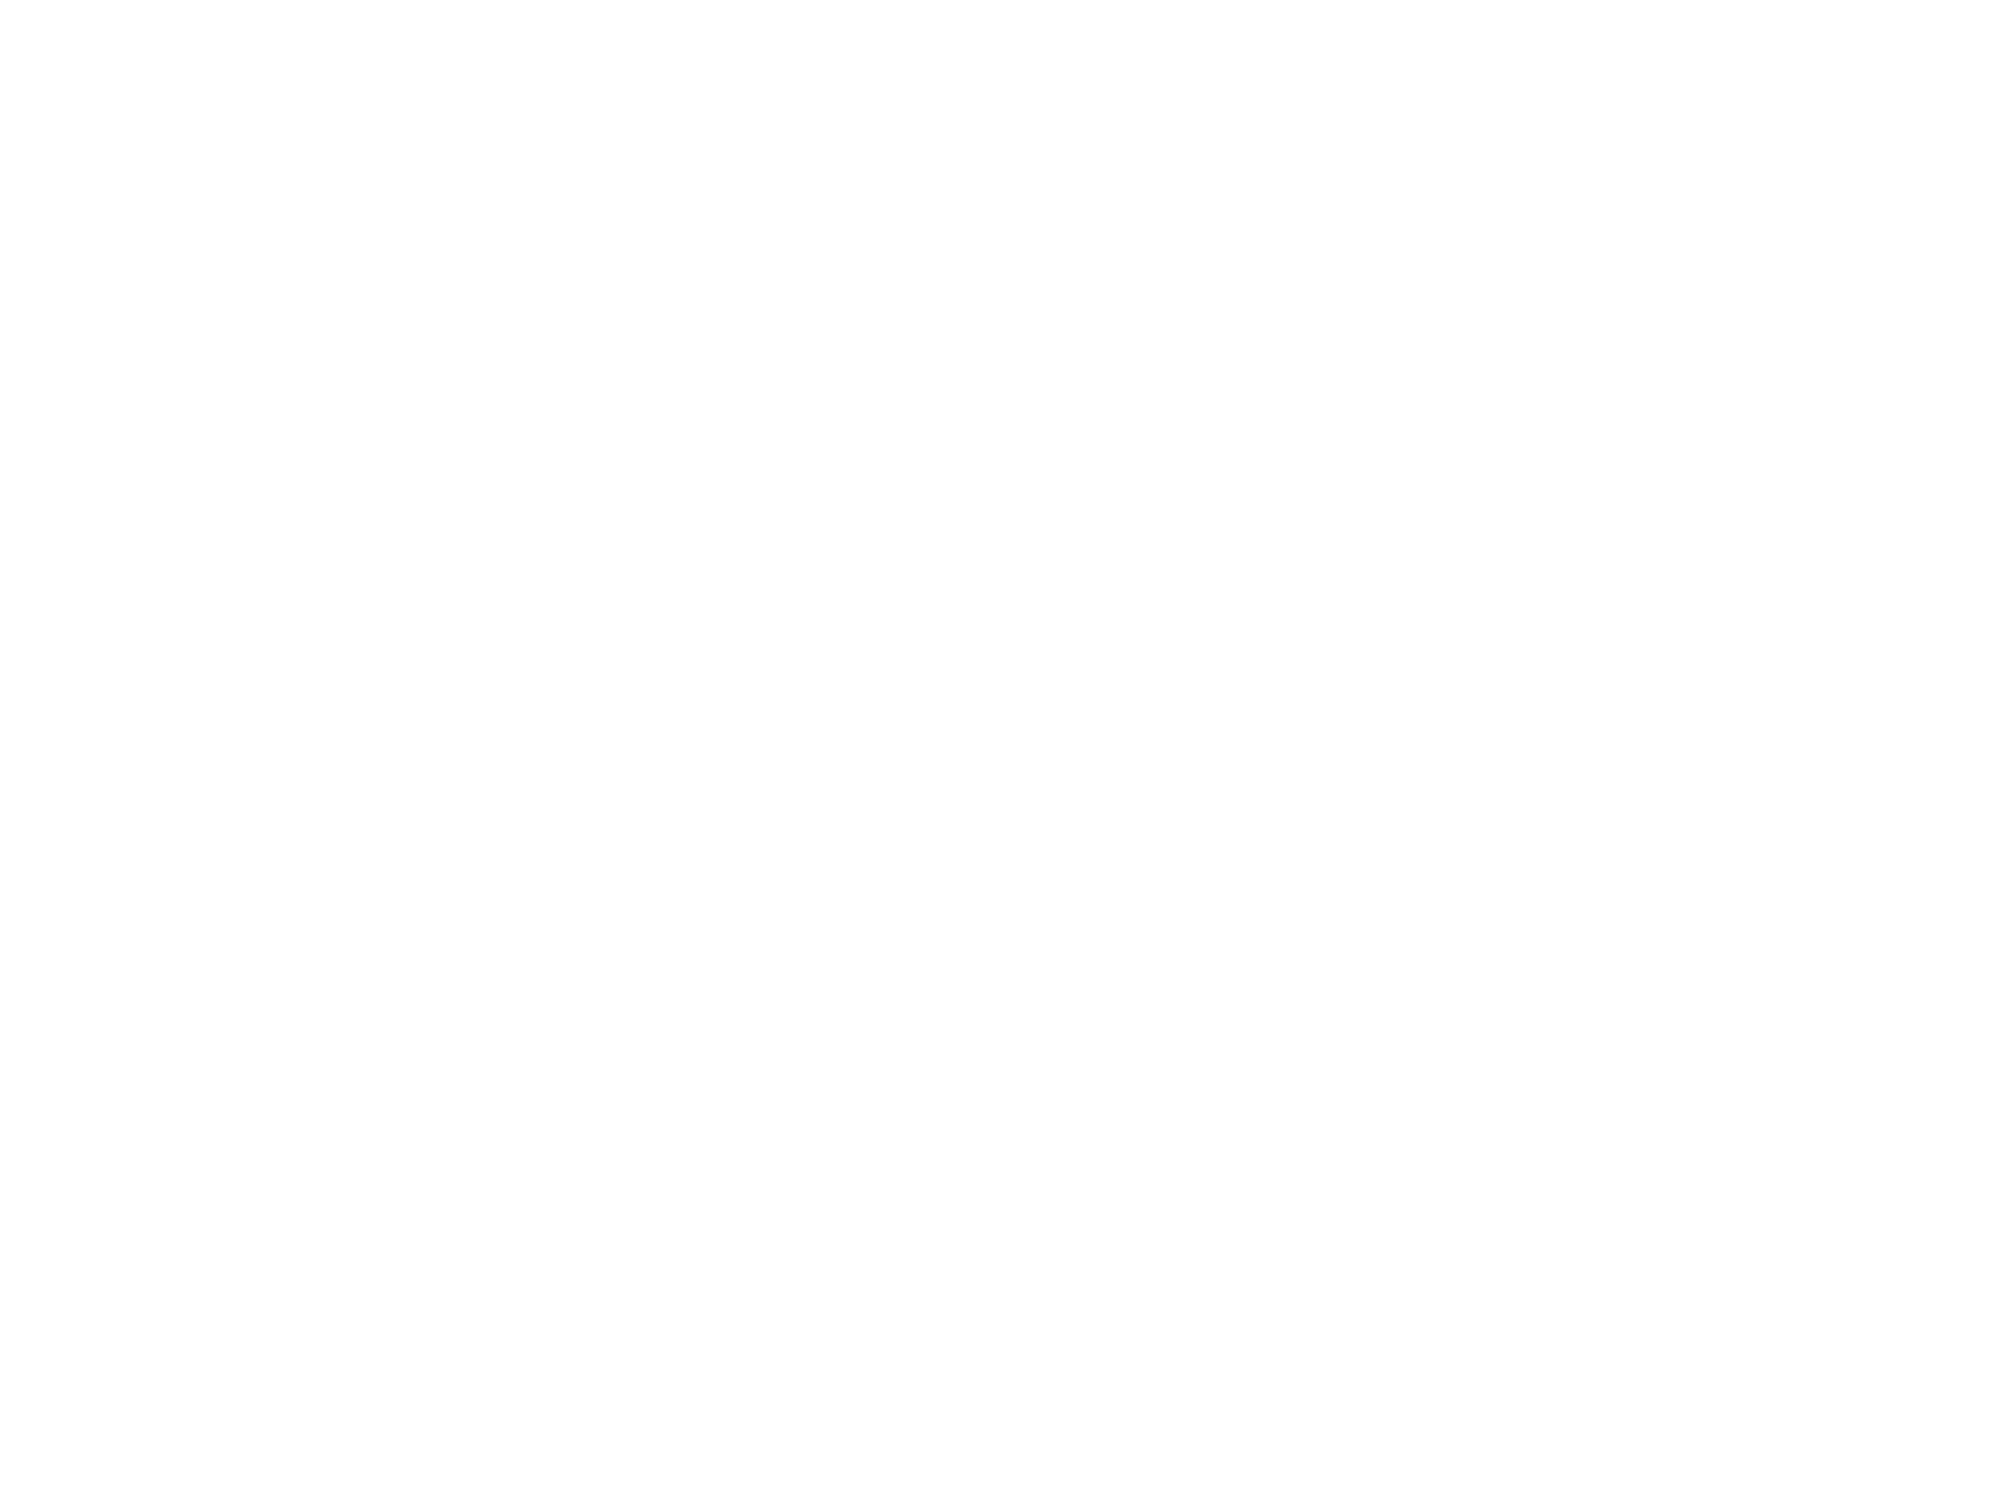 web-logo-kii-audio.png